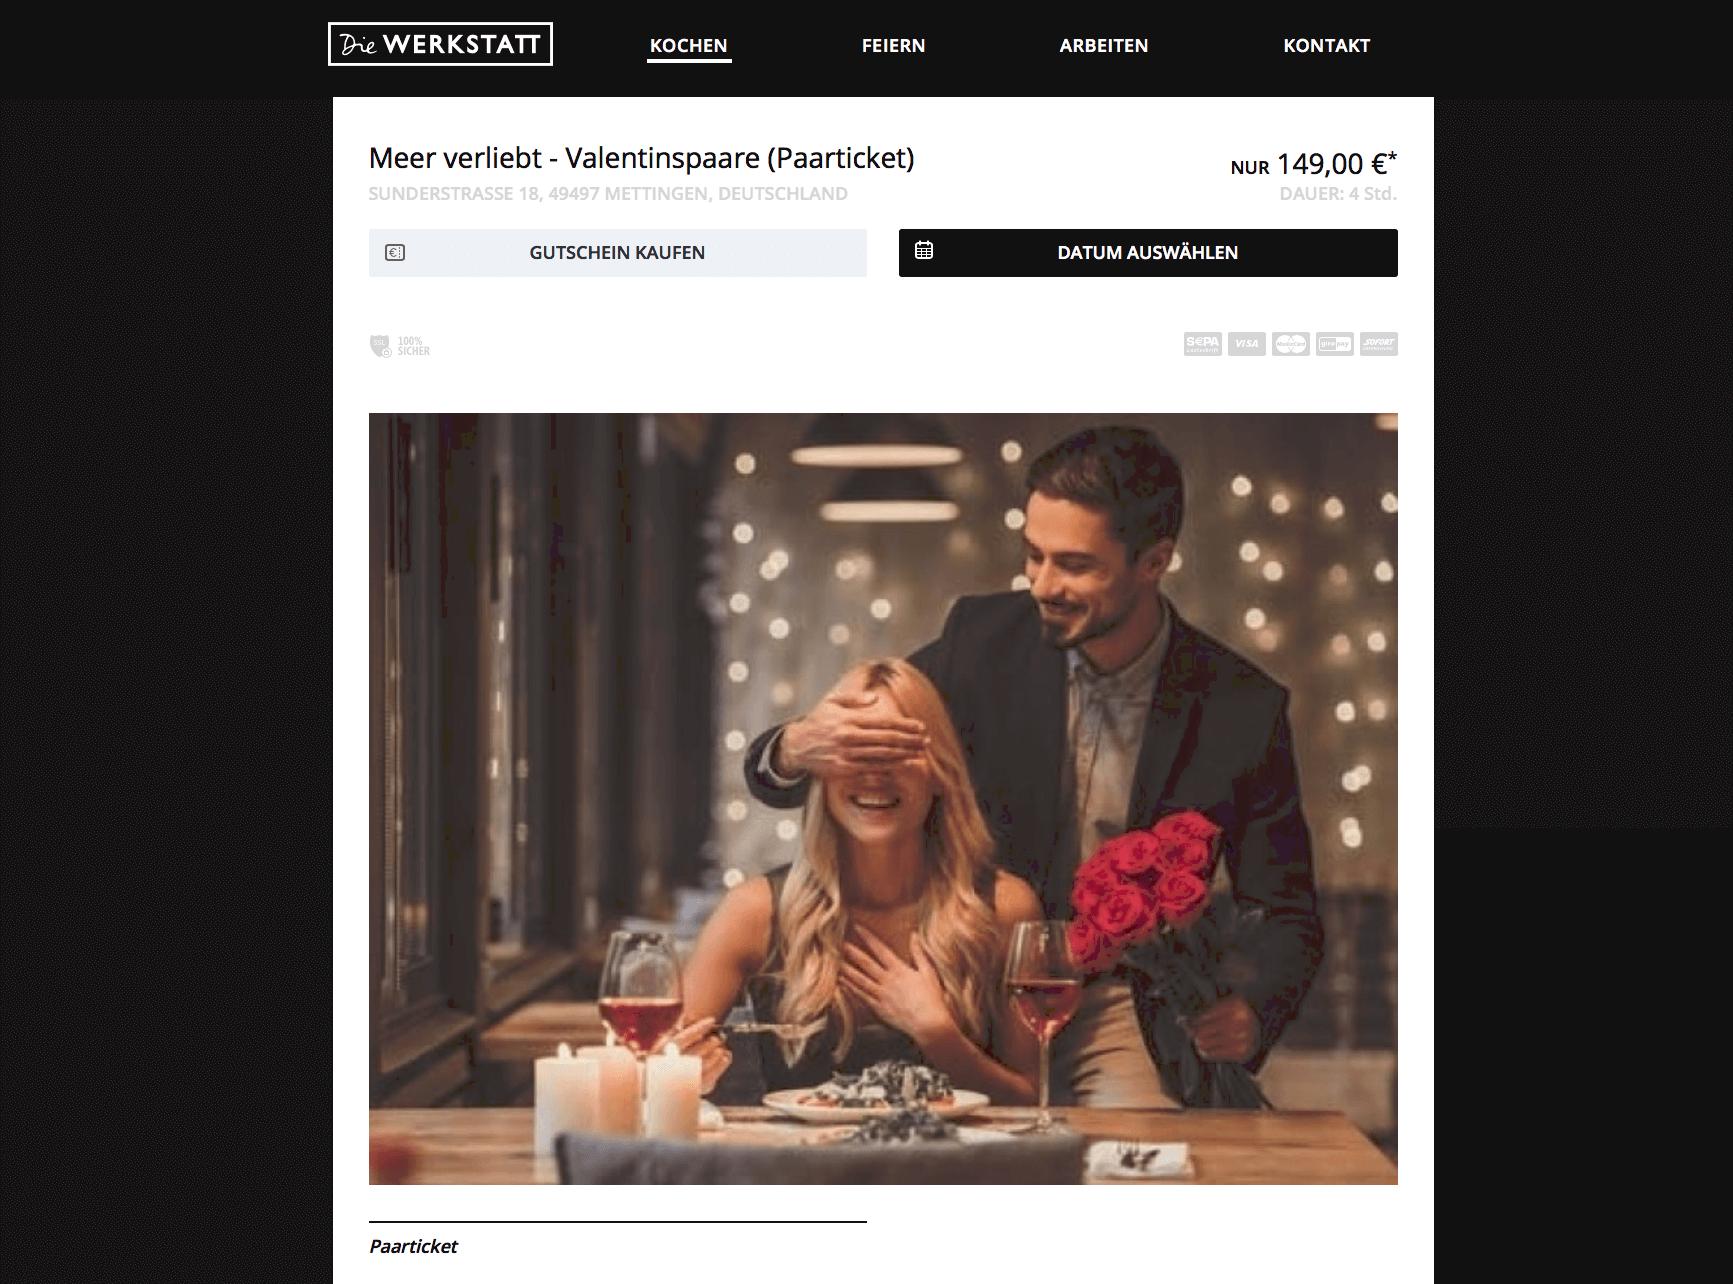 bookingkit-Valentinstag-2018-Best-Practice-Die-Werkstatt